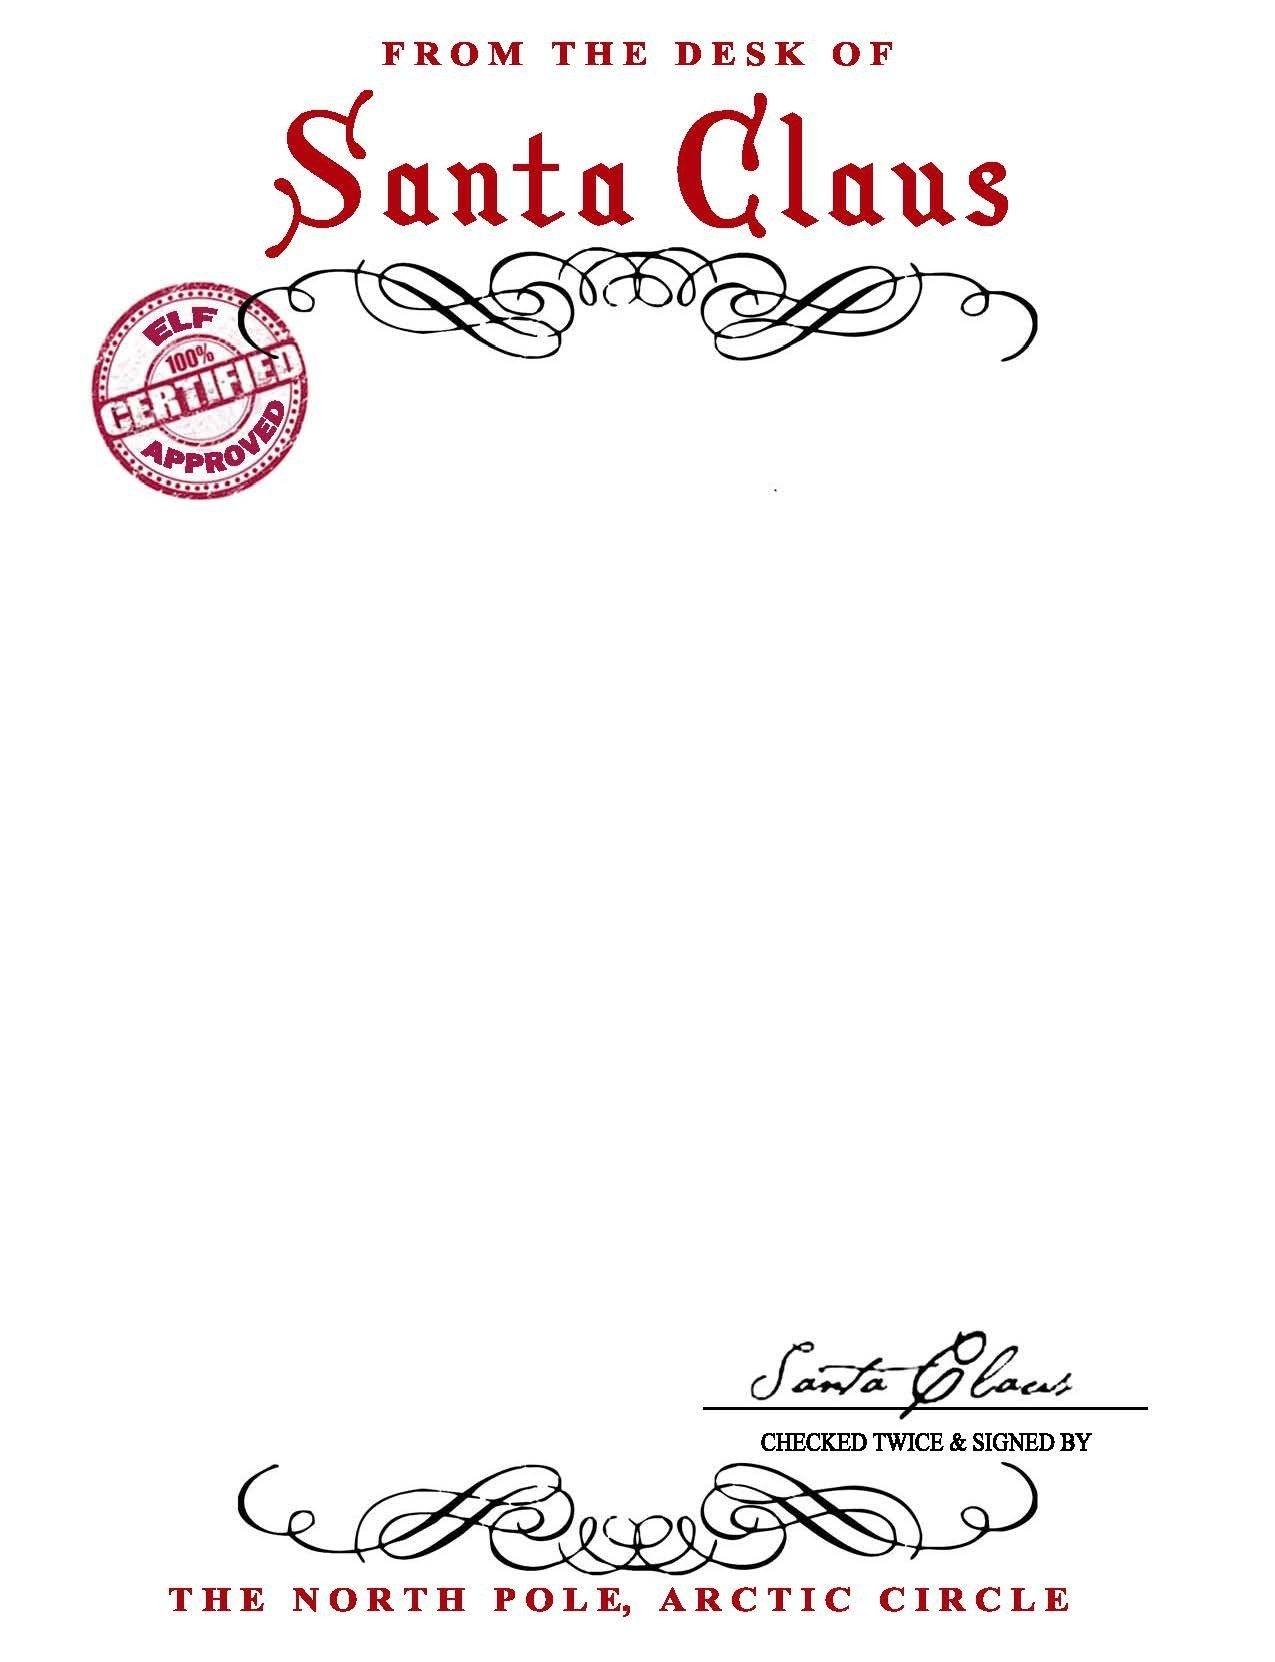 13 Best Images Of Free Printable Santa Letter Stationary - Santa - North Pole Stationary Printable Free